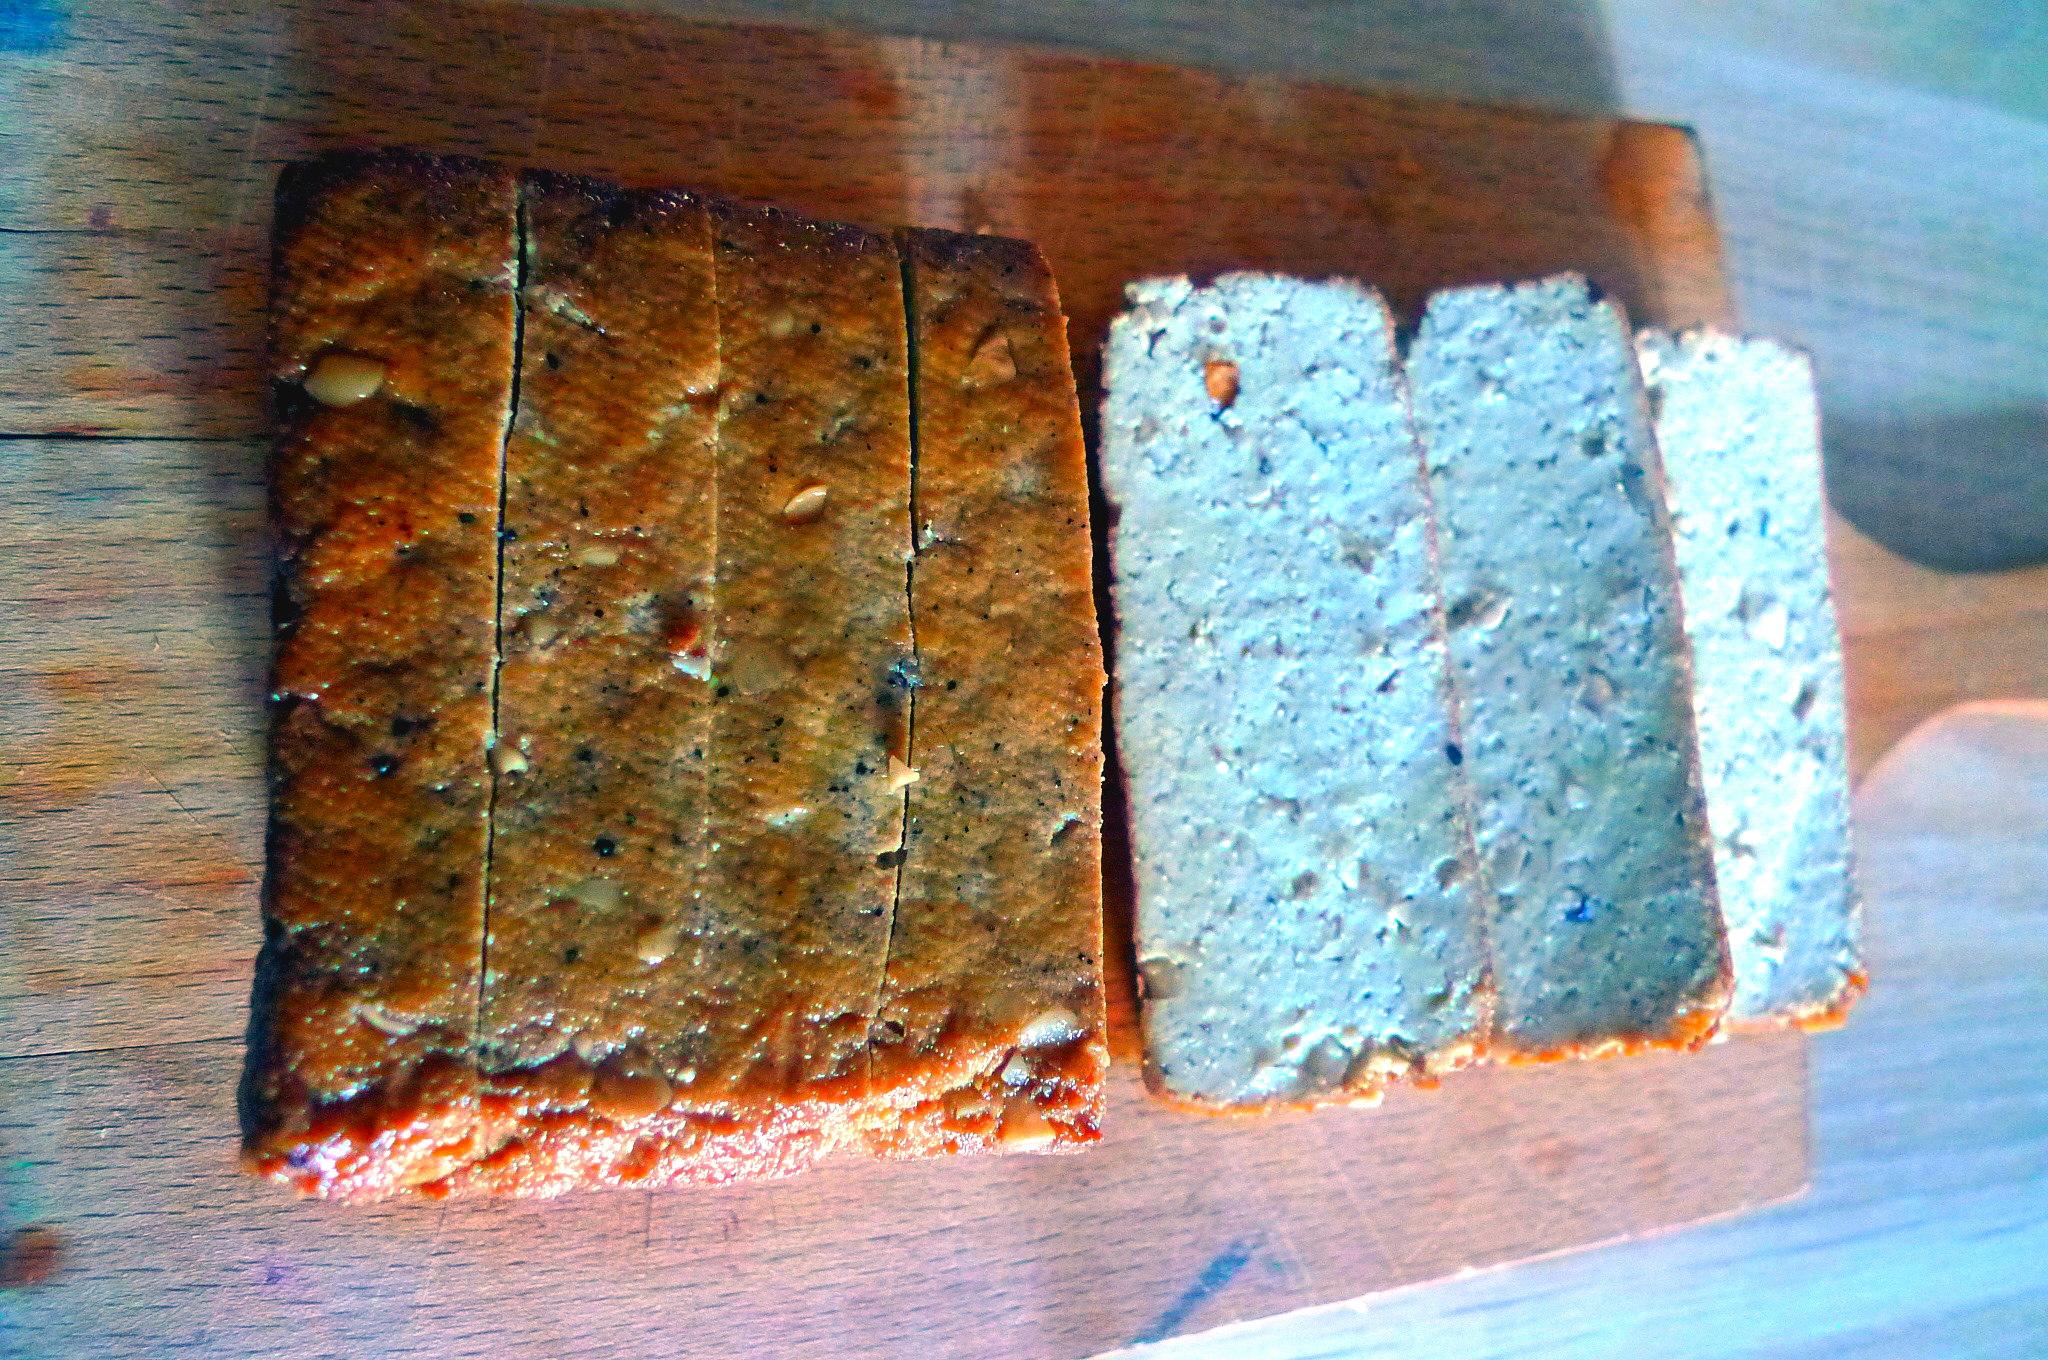 geraucherter-tofuhokkaidopellkartoffelnruhreifeldsalatmirabellenkompottvegetarisch-2